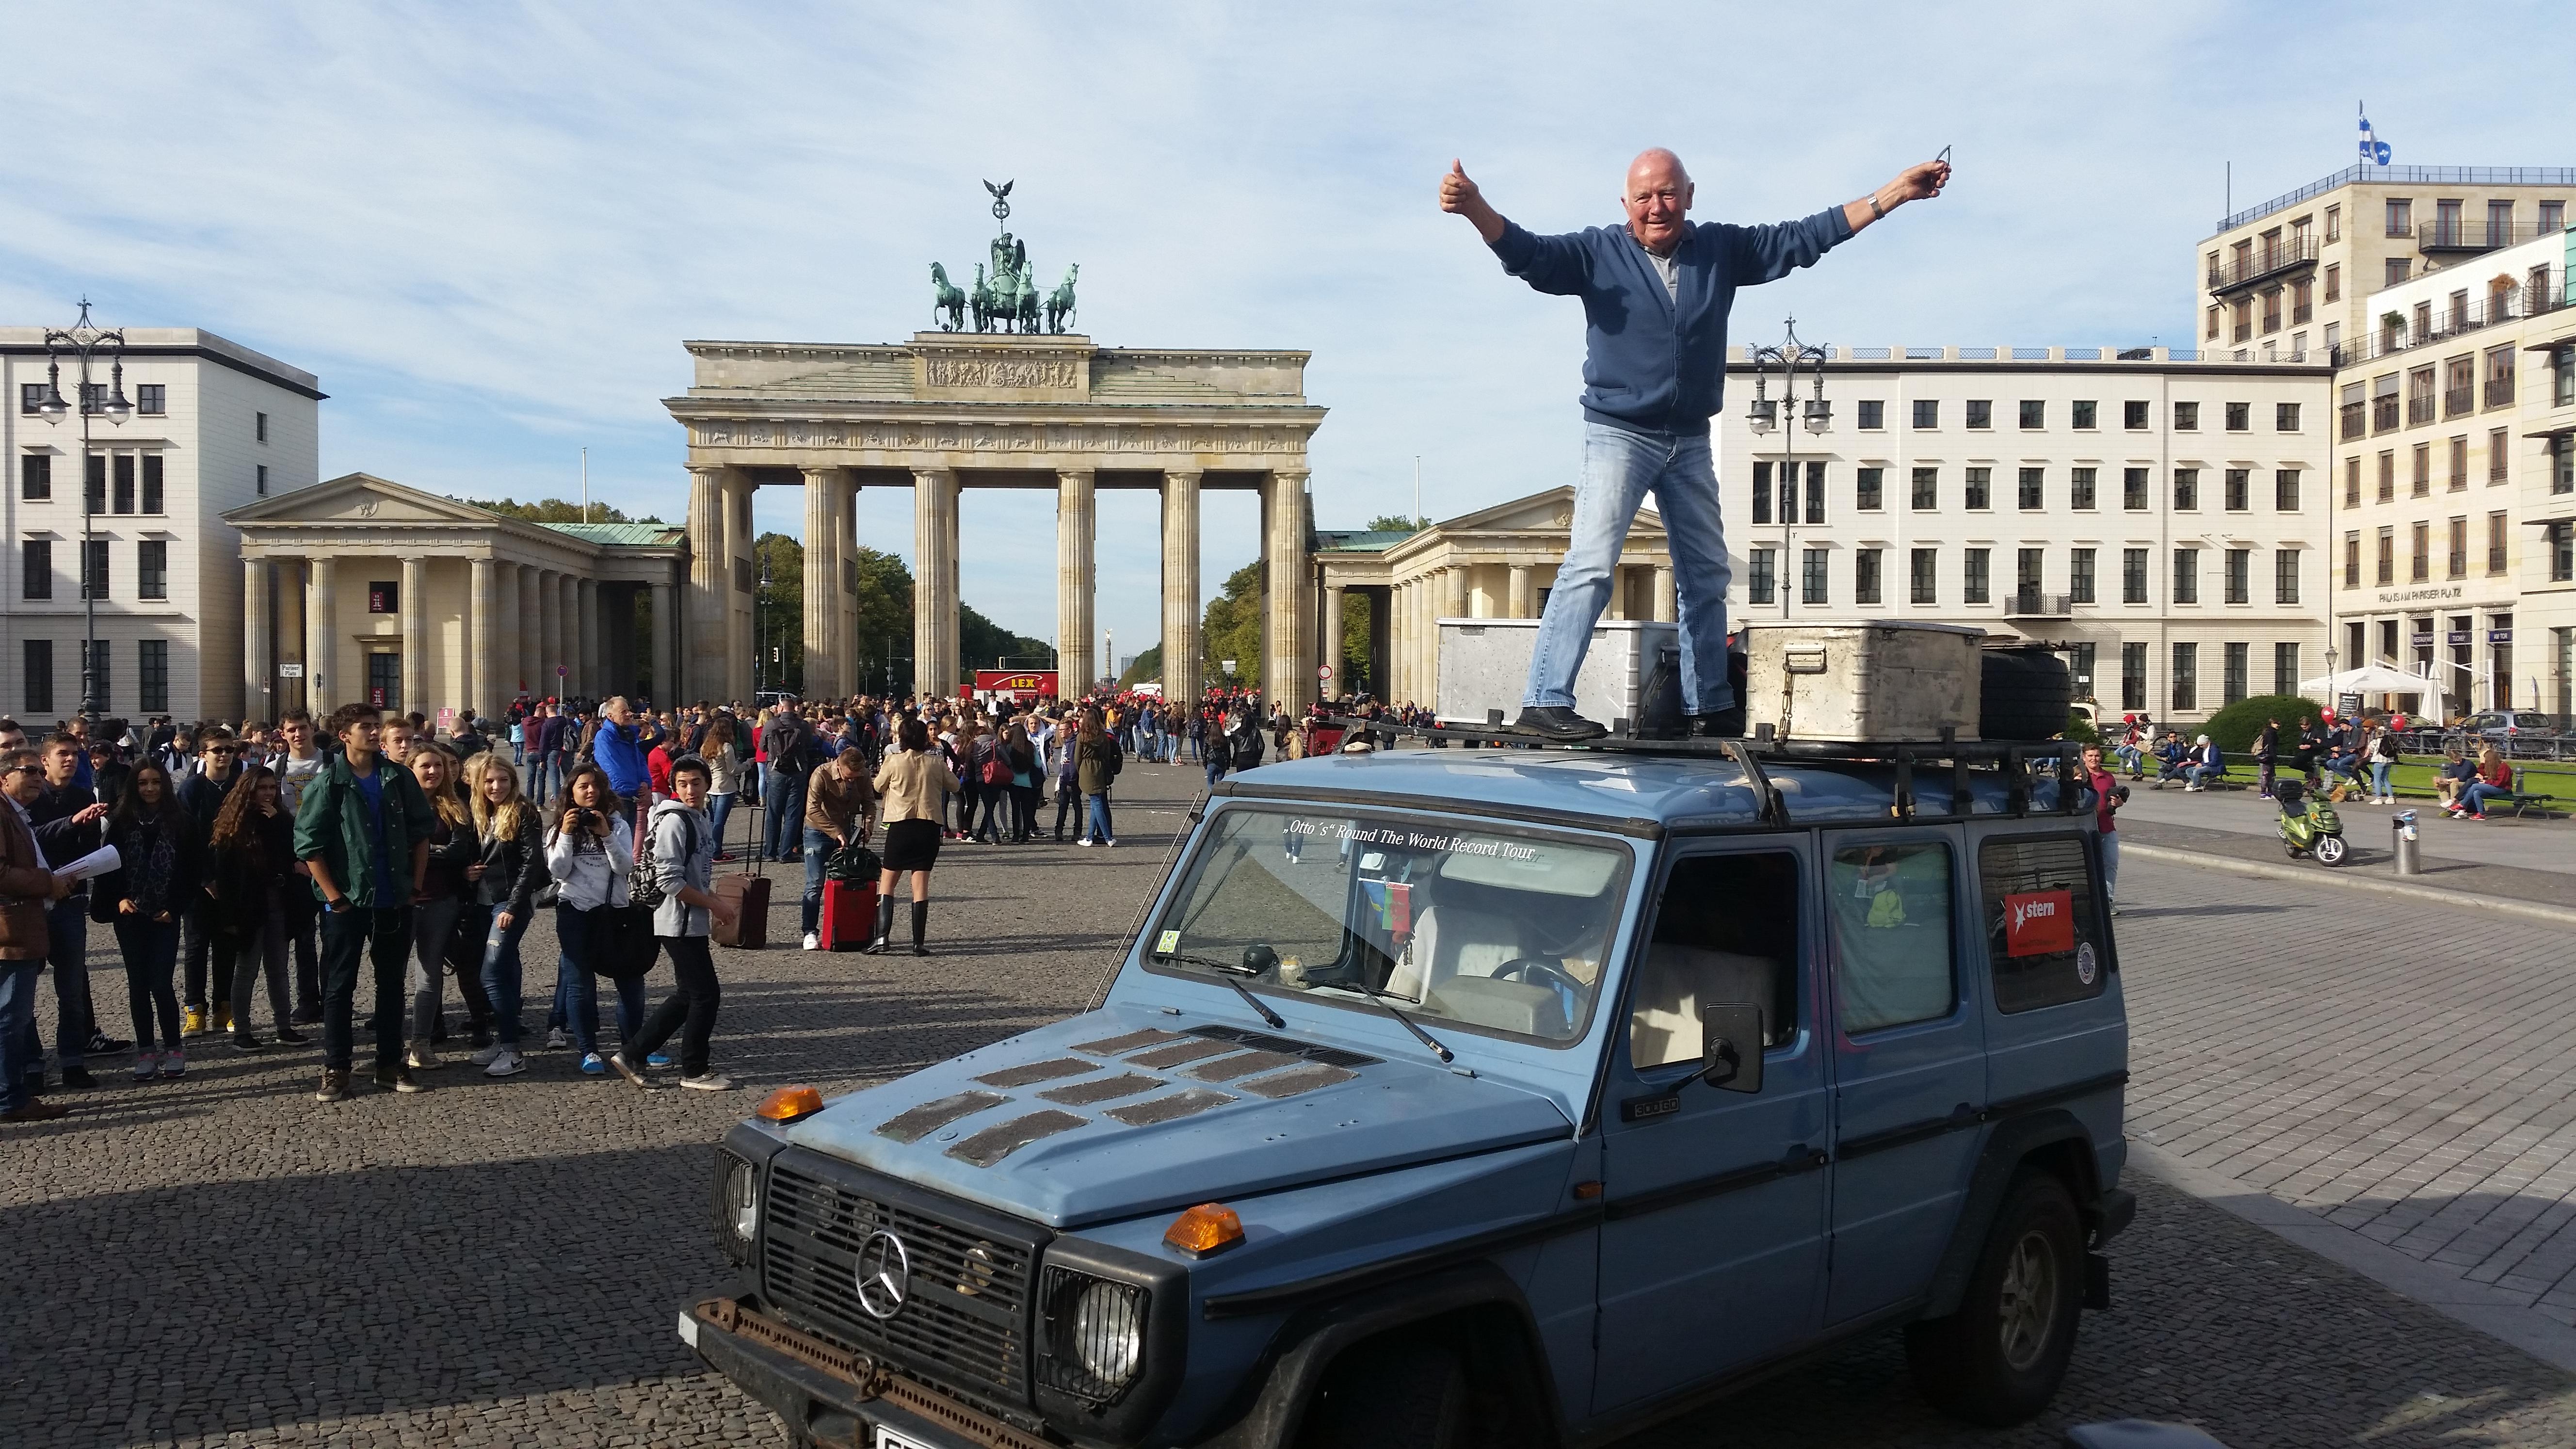 (c) Daimler AG/Gunther Holtorf